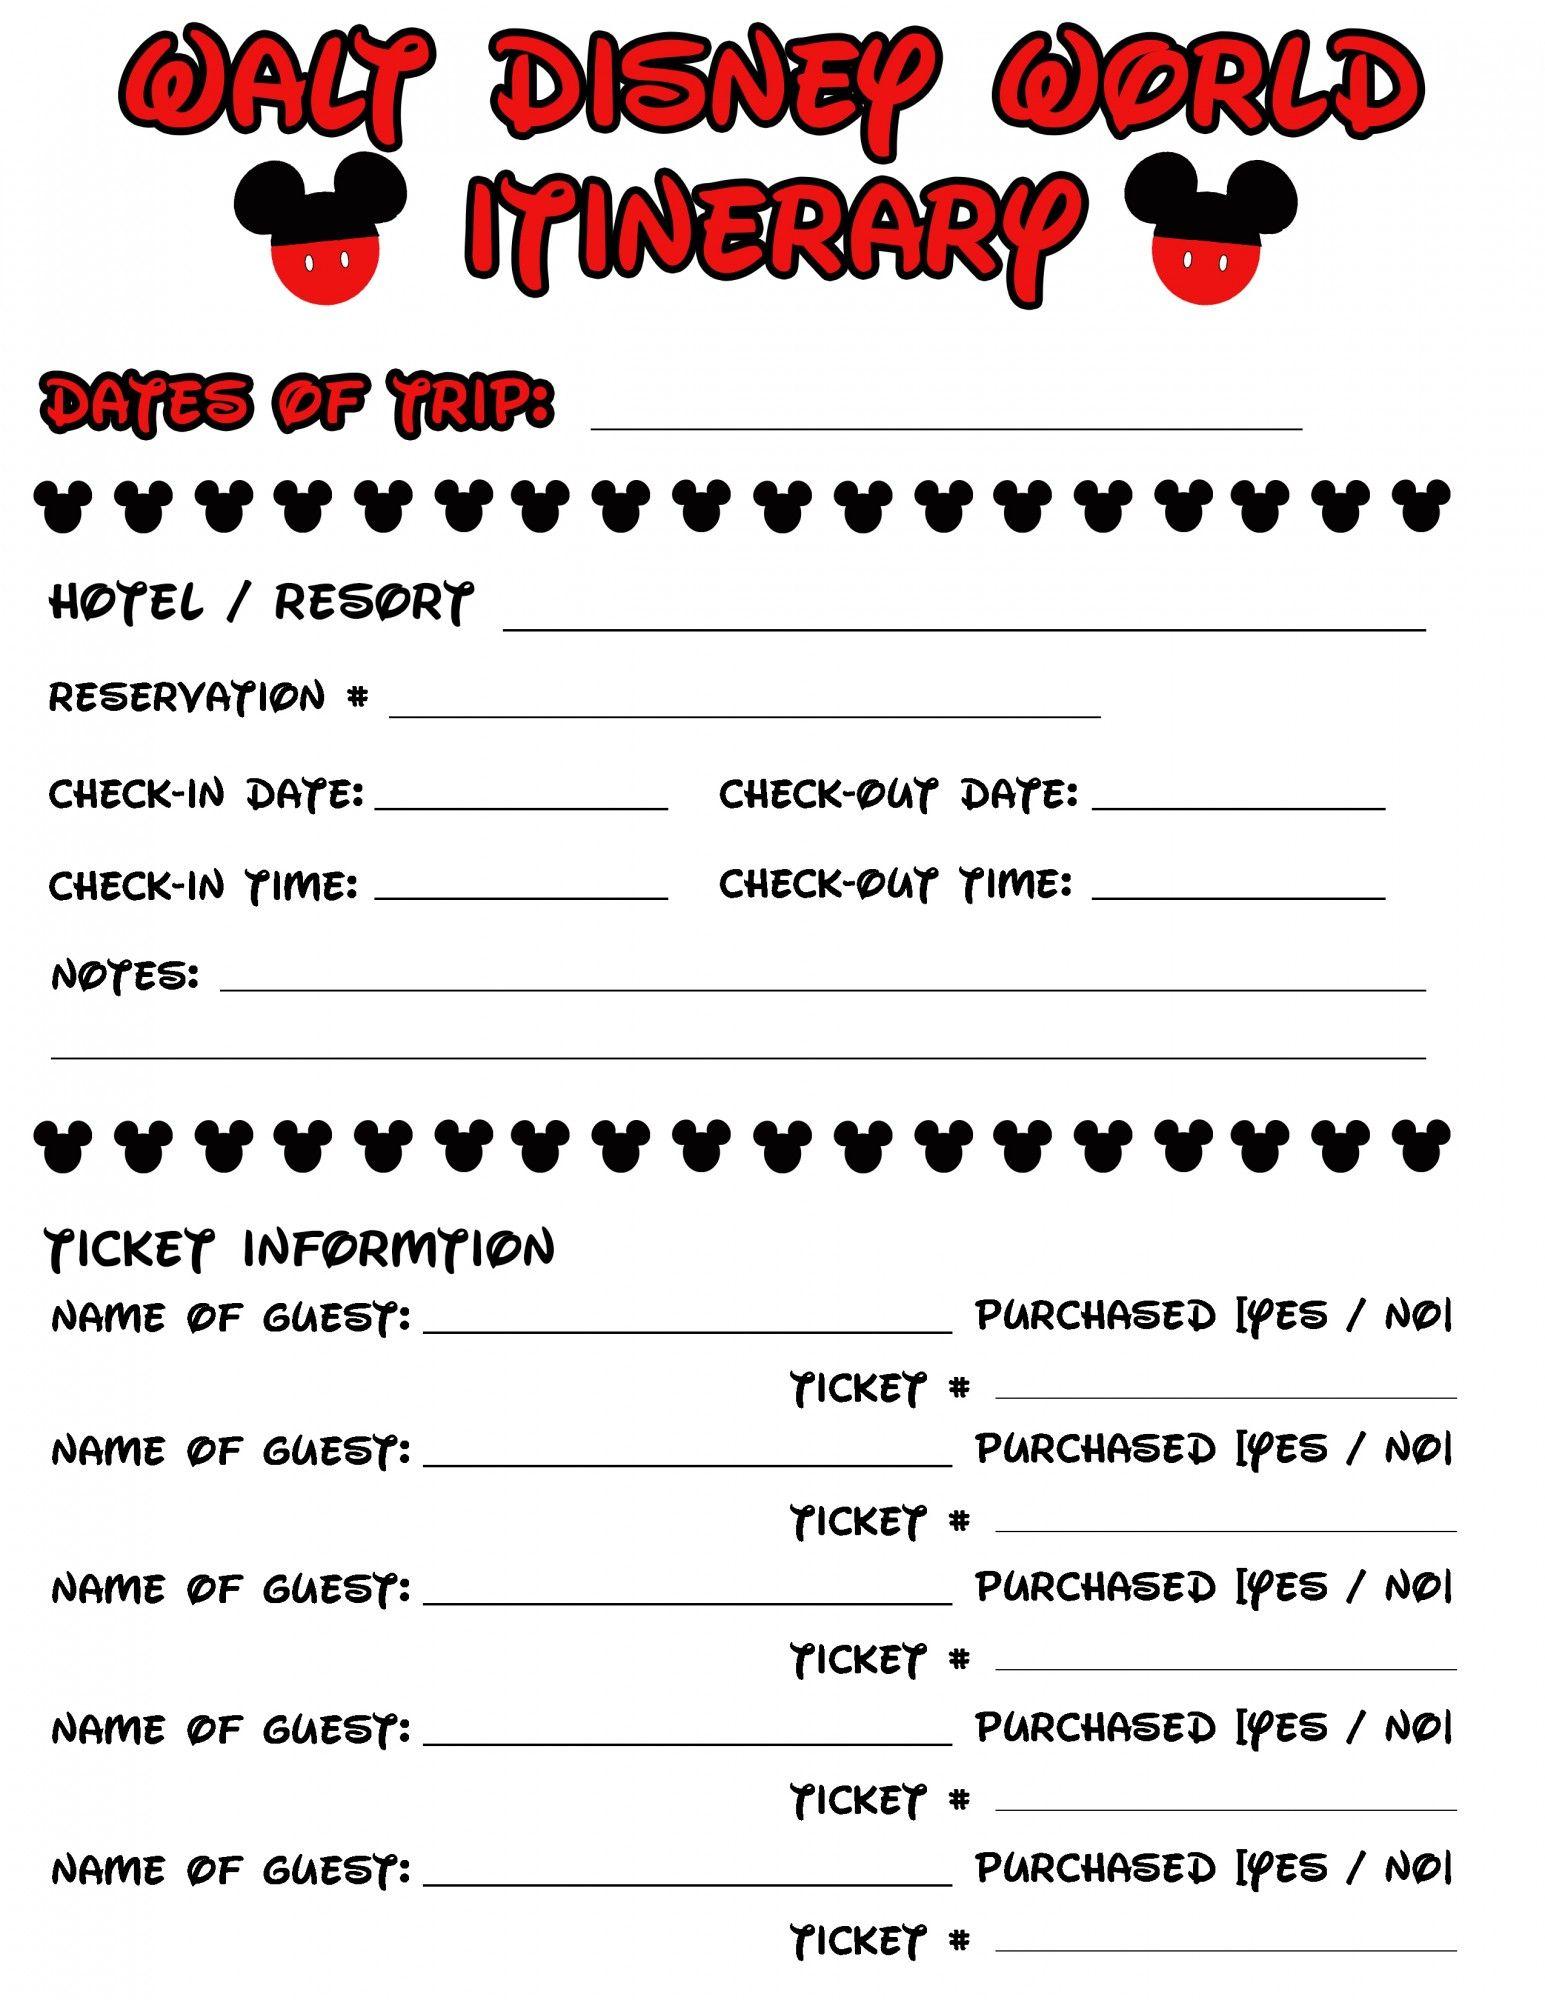 Disney Agenda & Itinerary Free Printable | Disney Vacation